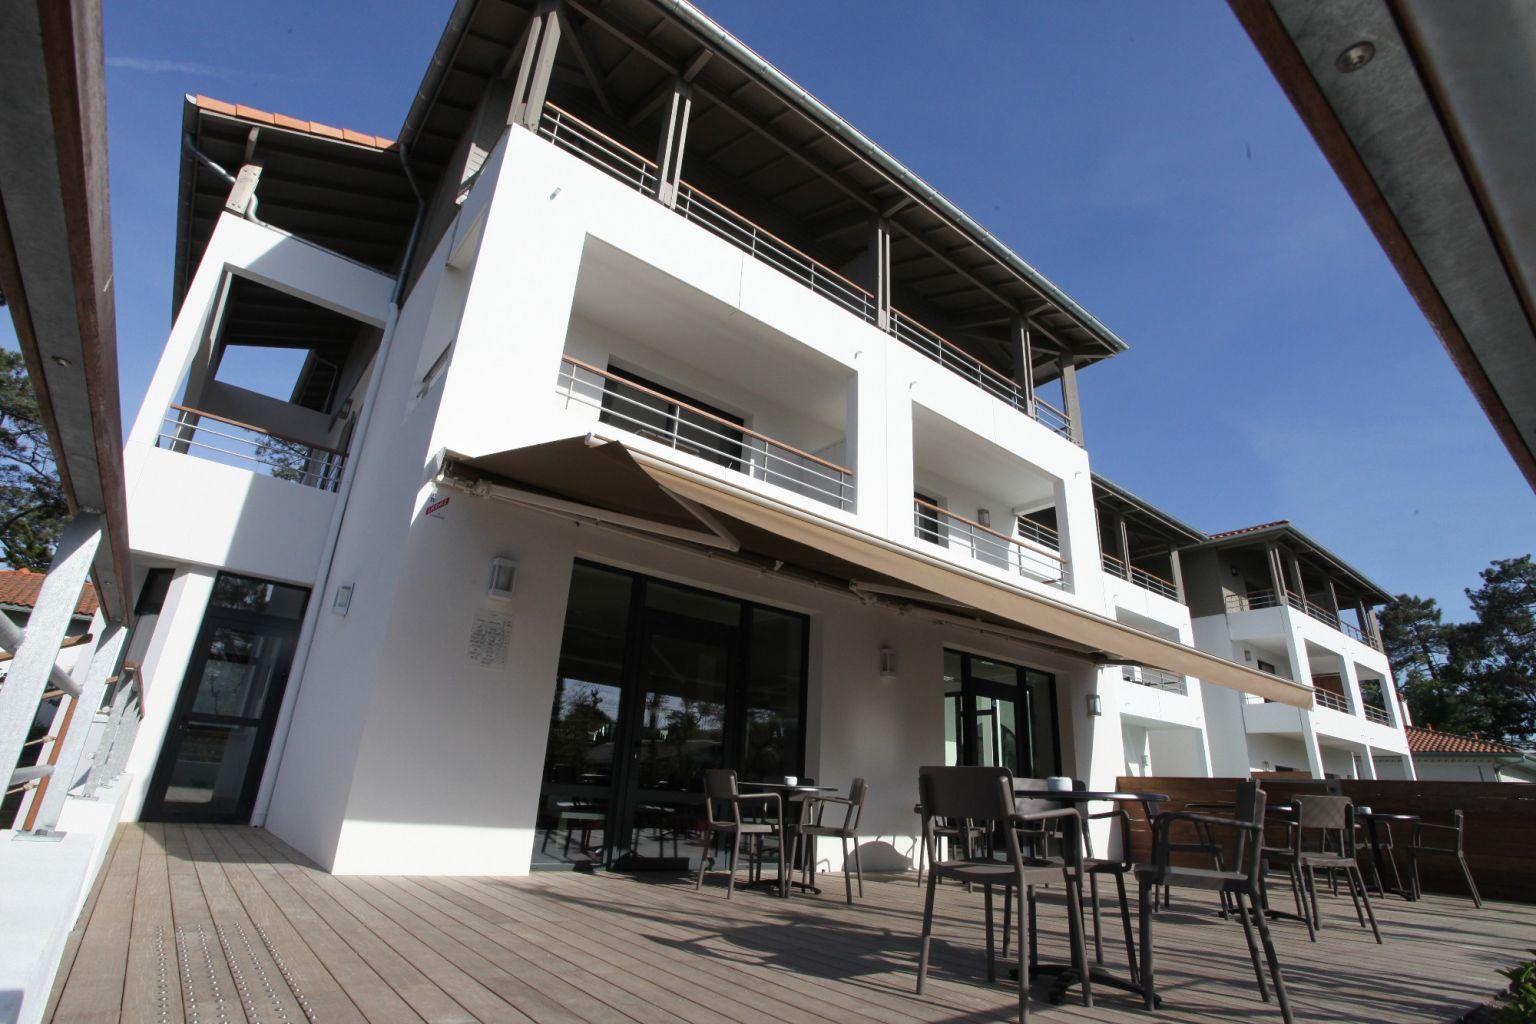 Stores cousseau h tel 202 hossegor for Appart hotel hossegor